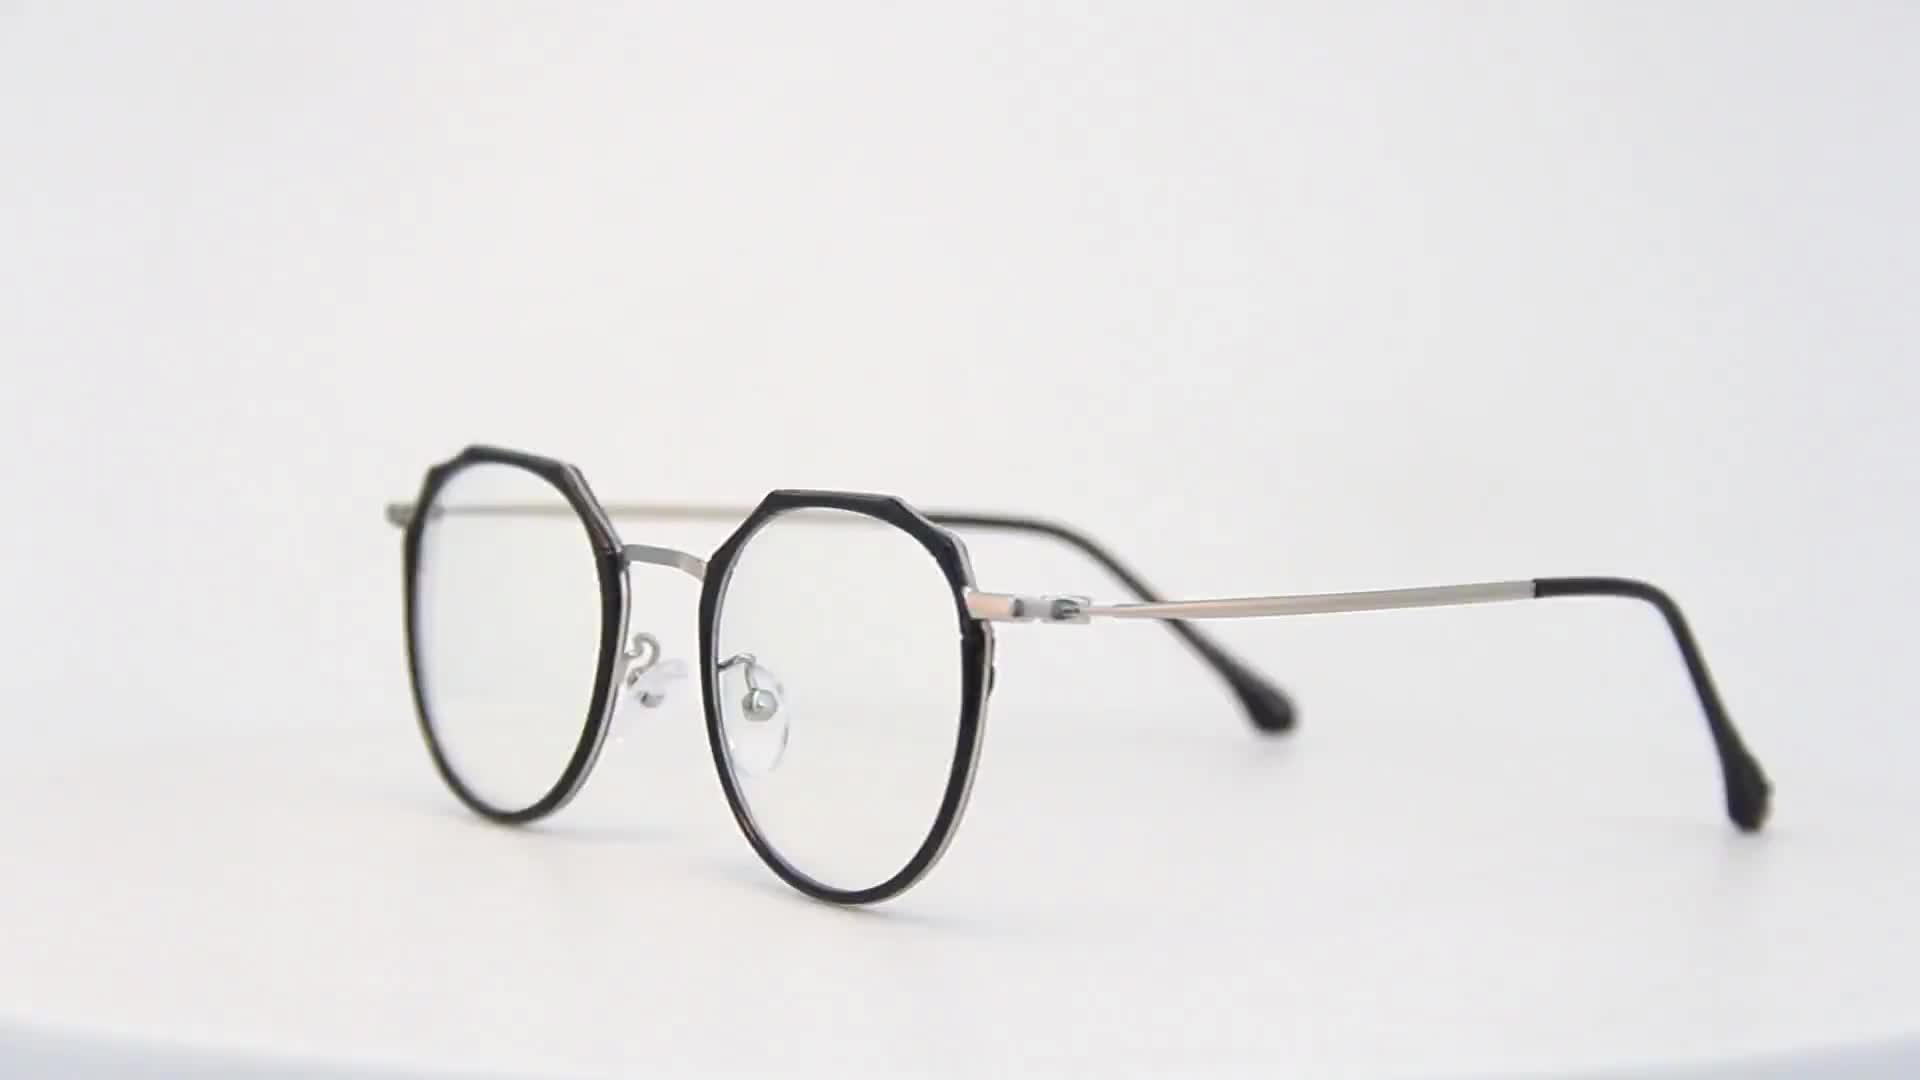 classic round plastic metal hinge optical glasses eyeglasses frames 2019